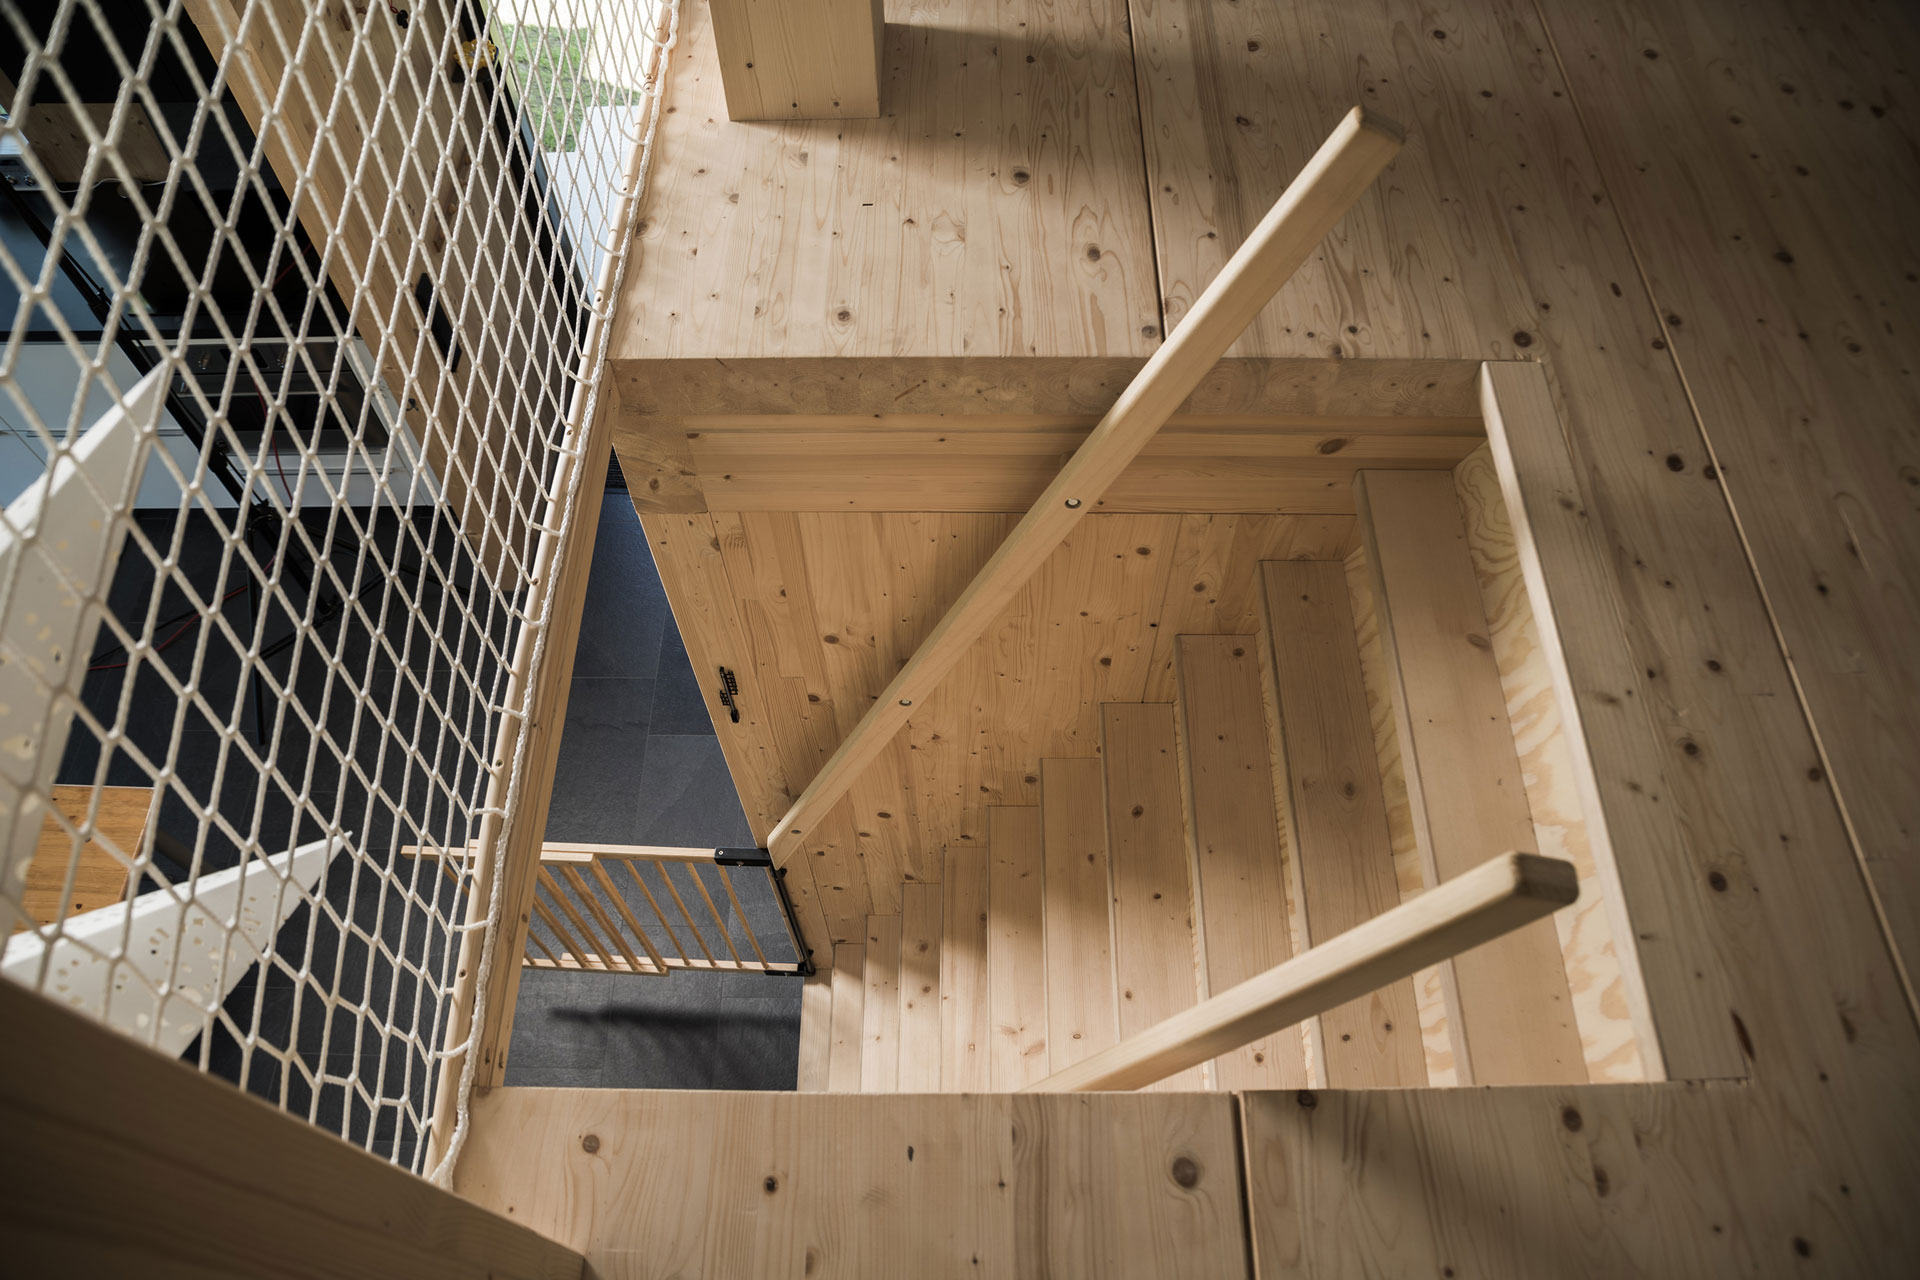 Ferienhaus im Landkreis NWM (01) / Nahaufnahme Innen